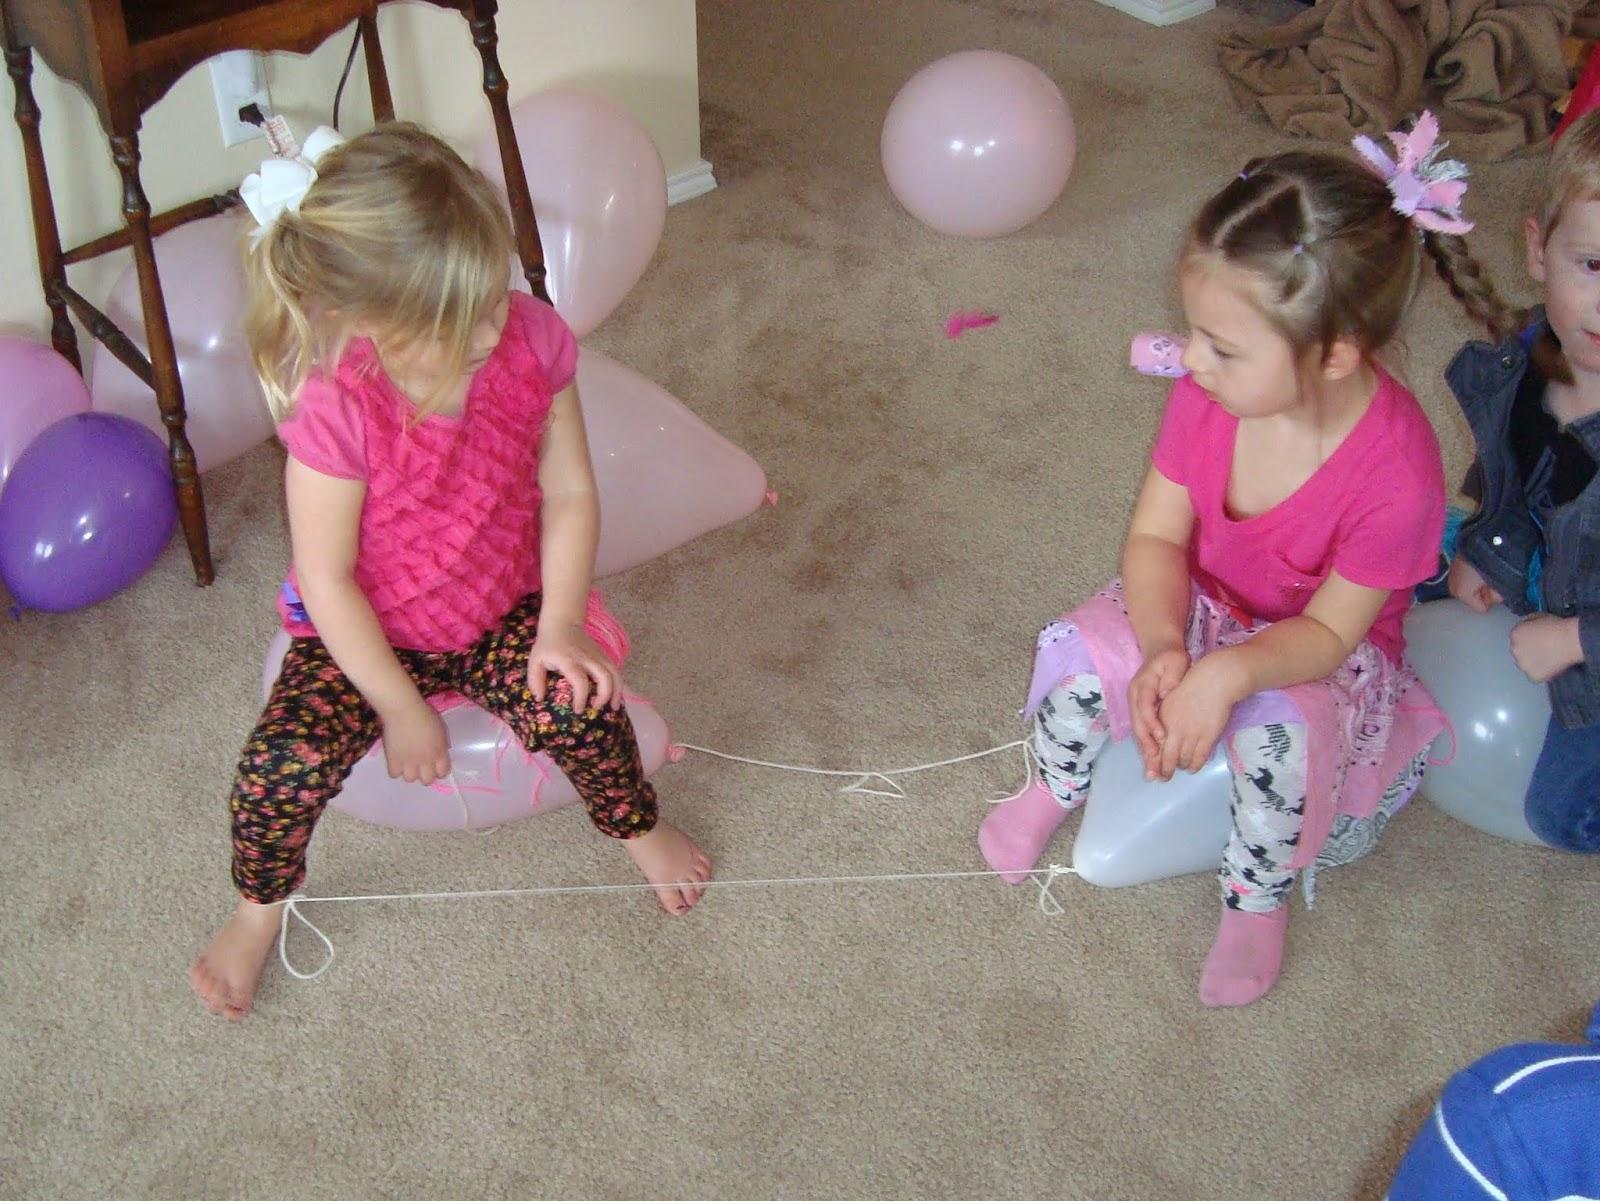 Sit Pop Balloon: Bounce Vk Images